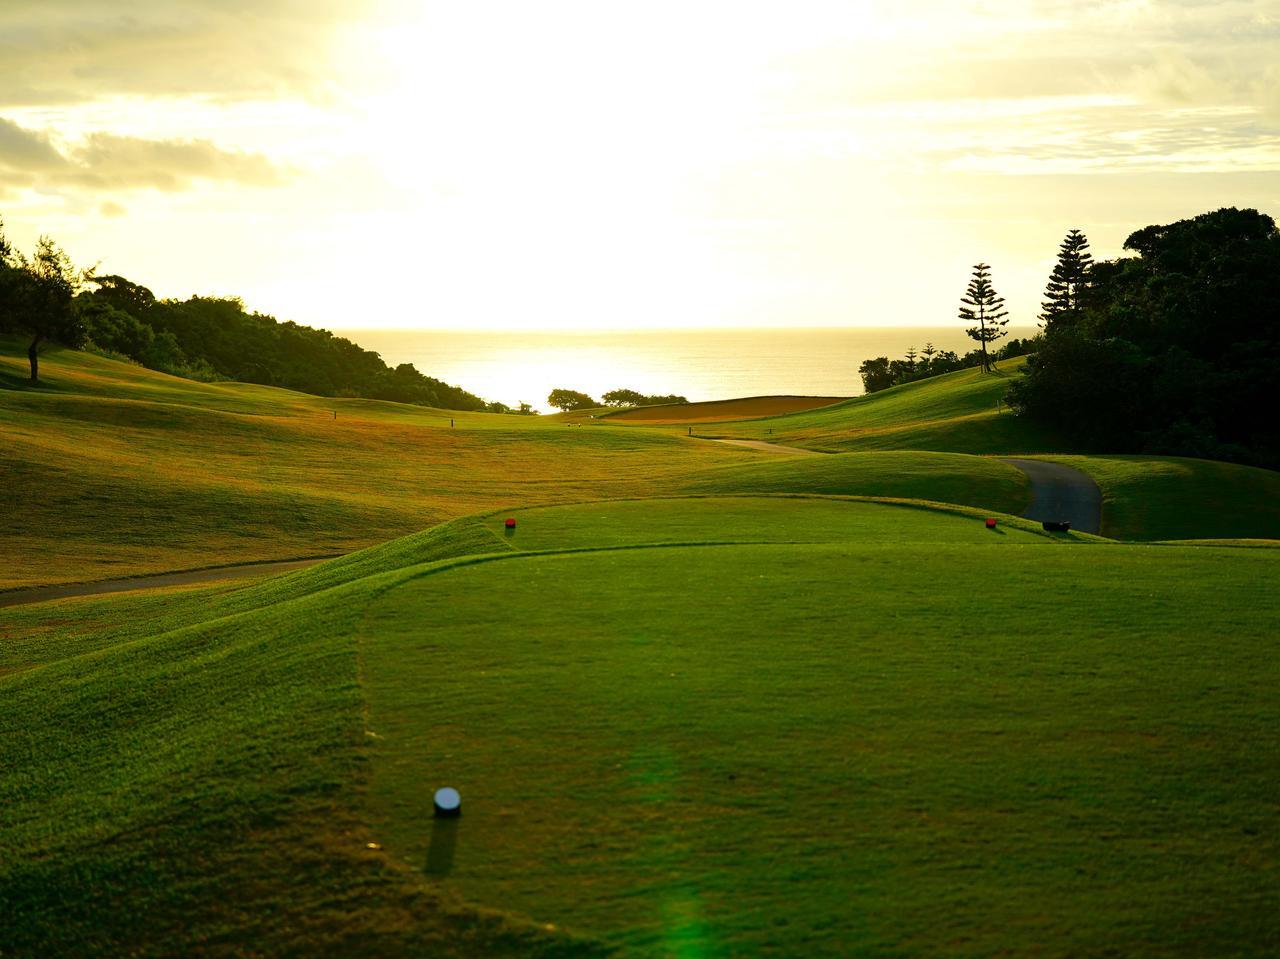 Images : 1番目の画像 - シギラベイカントリークラブ - ゴルフへ行こうWEB by ゴルフダイジェスト